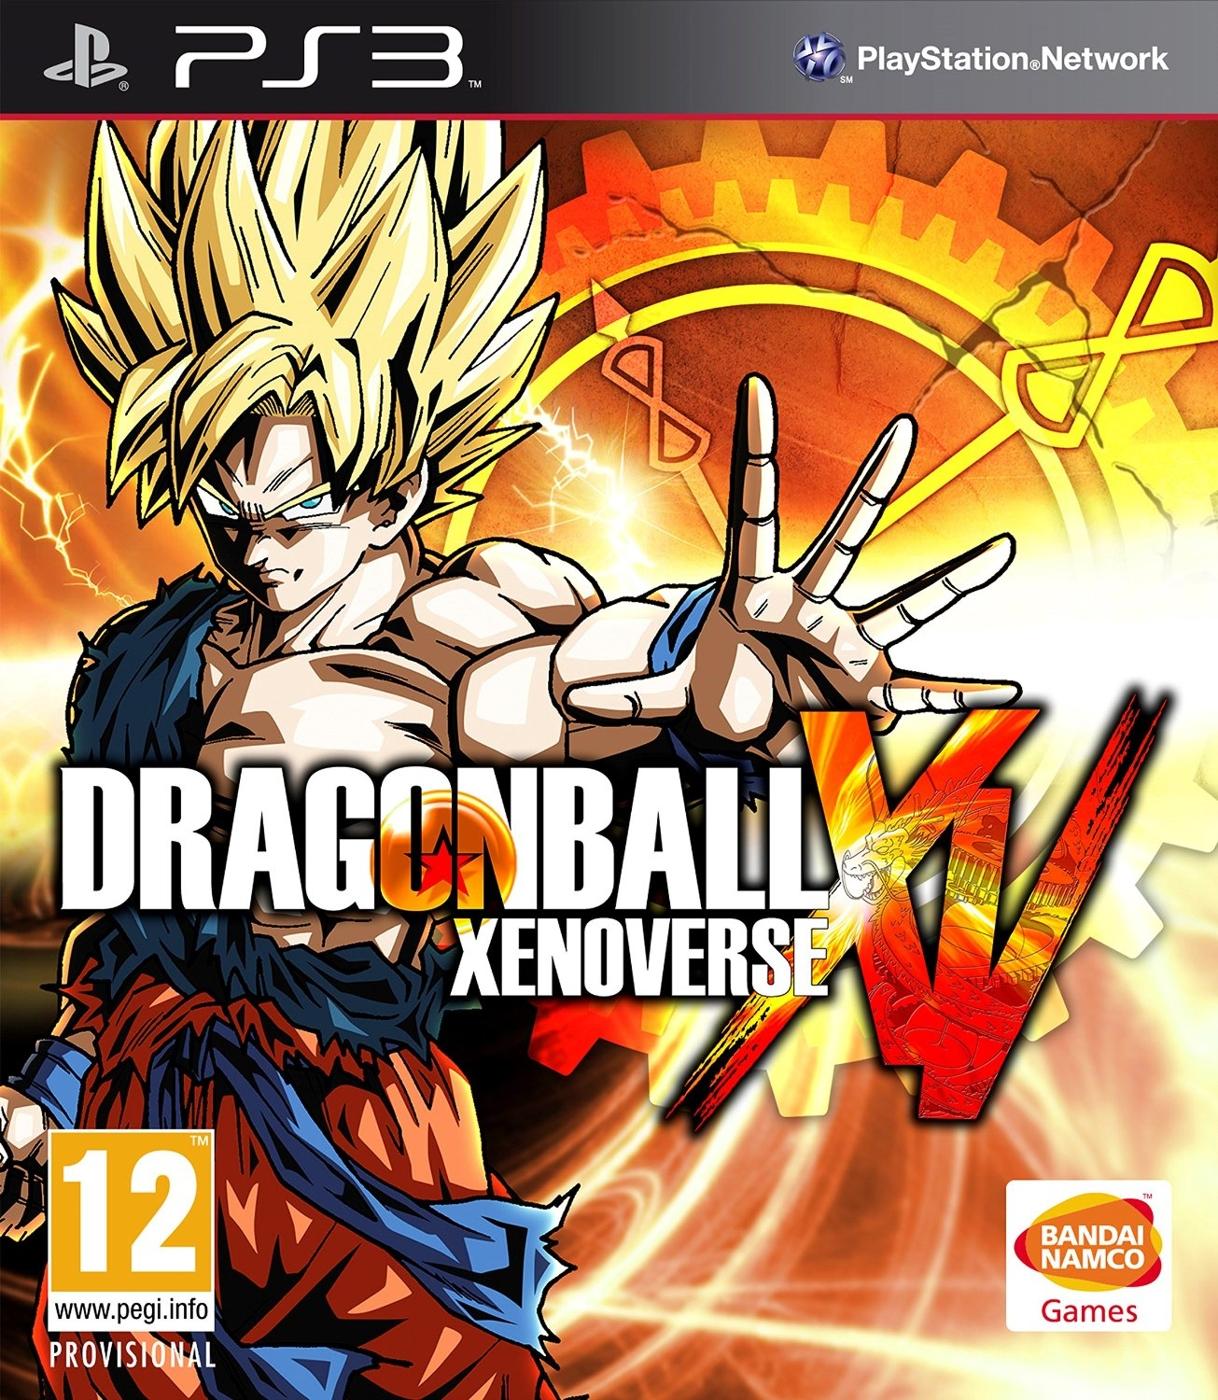 PS3七龍珠XV附4款特典異戰超宇宙-日文英文版-Dragonball Xenoverse